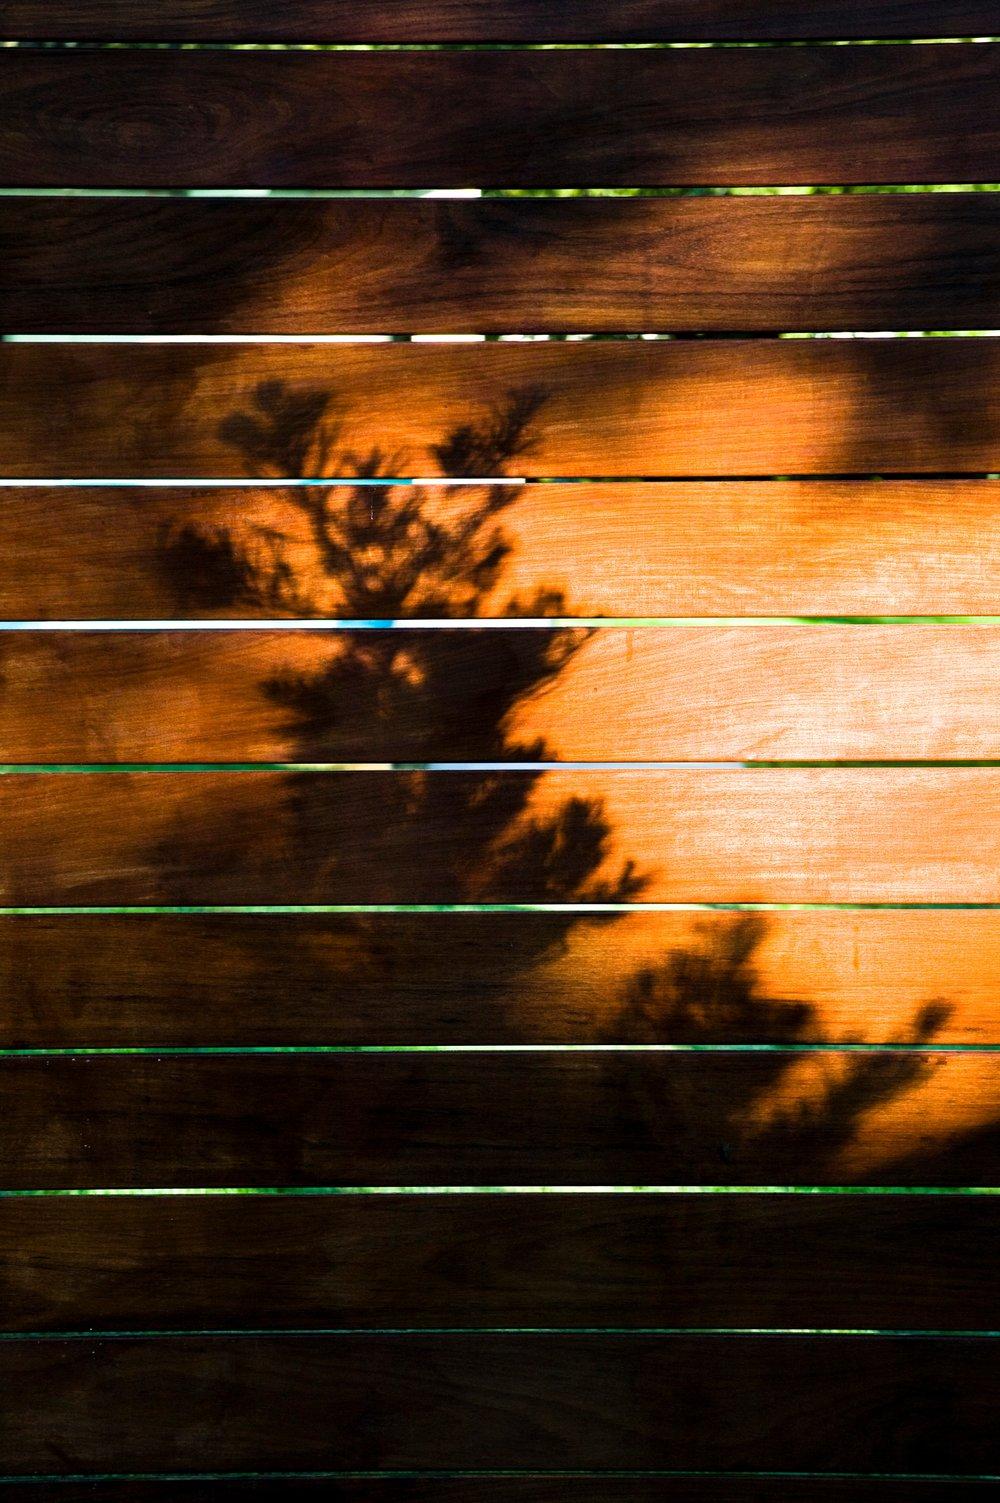 Fences_006.JPG